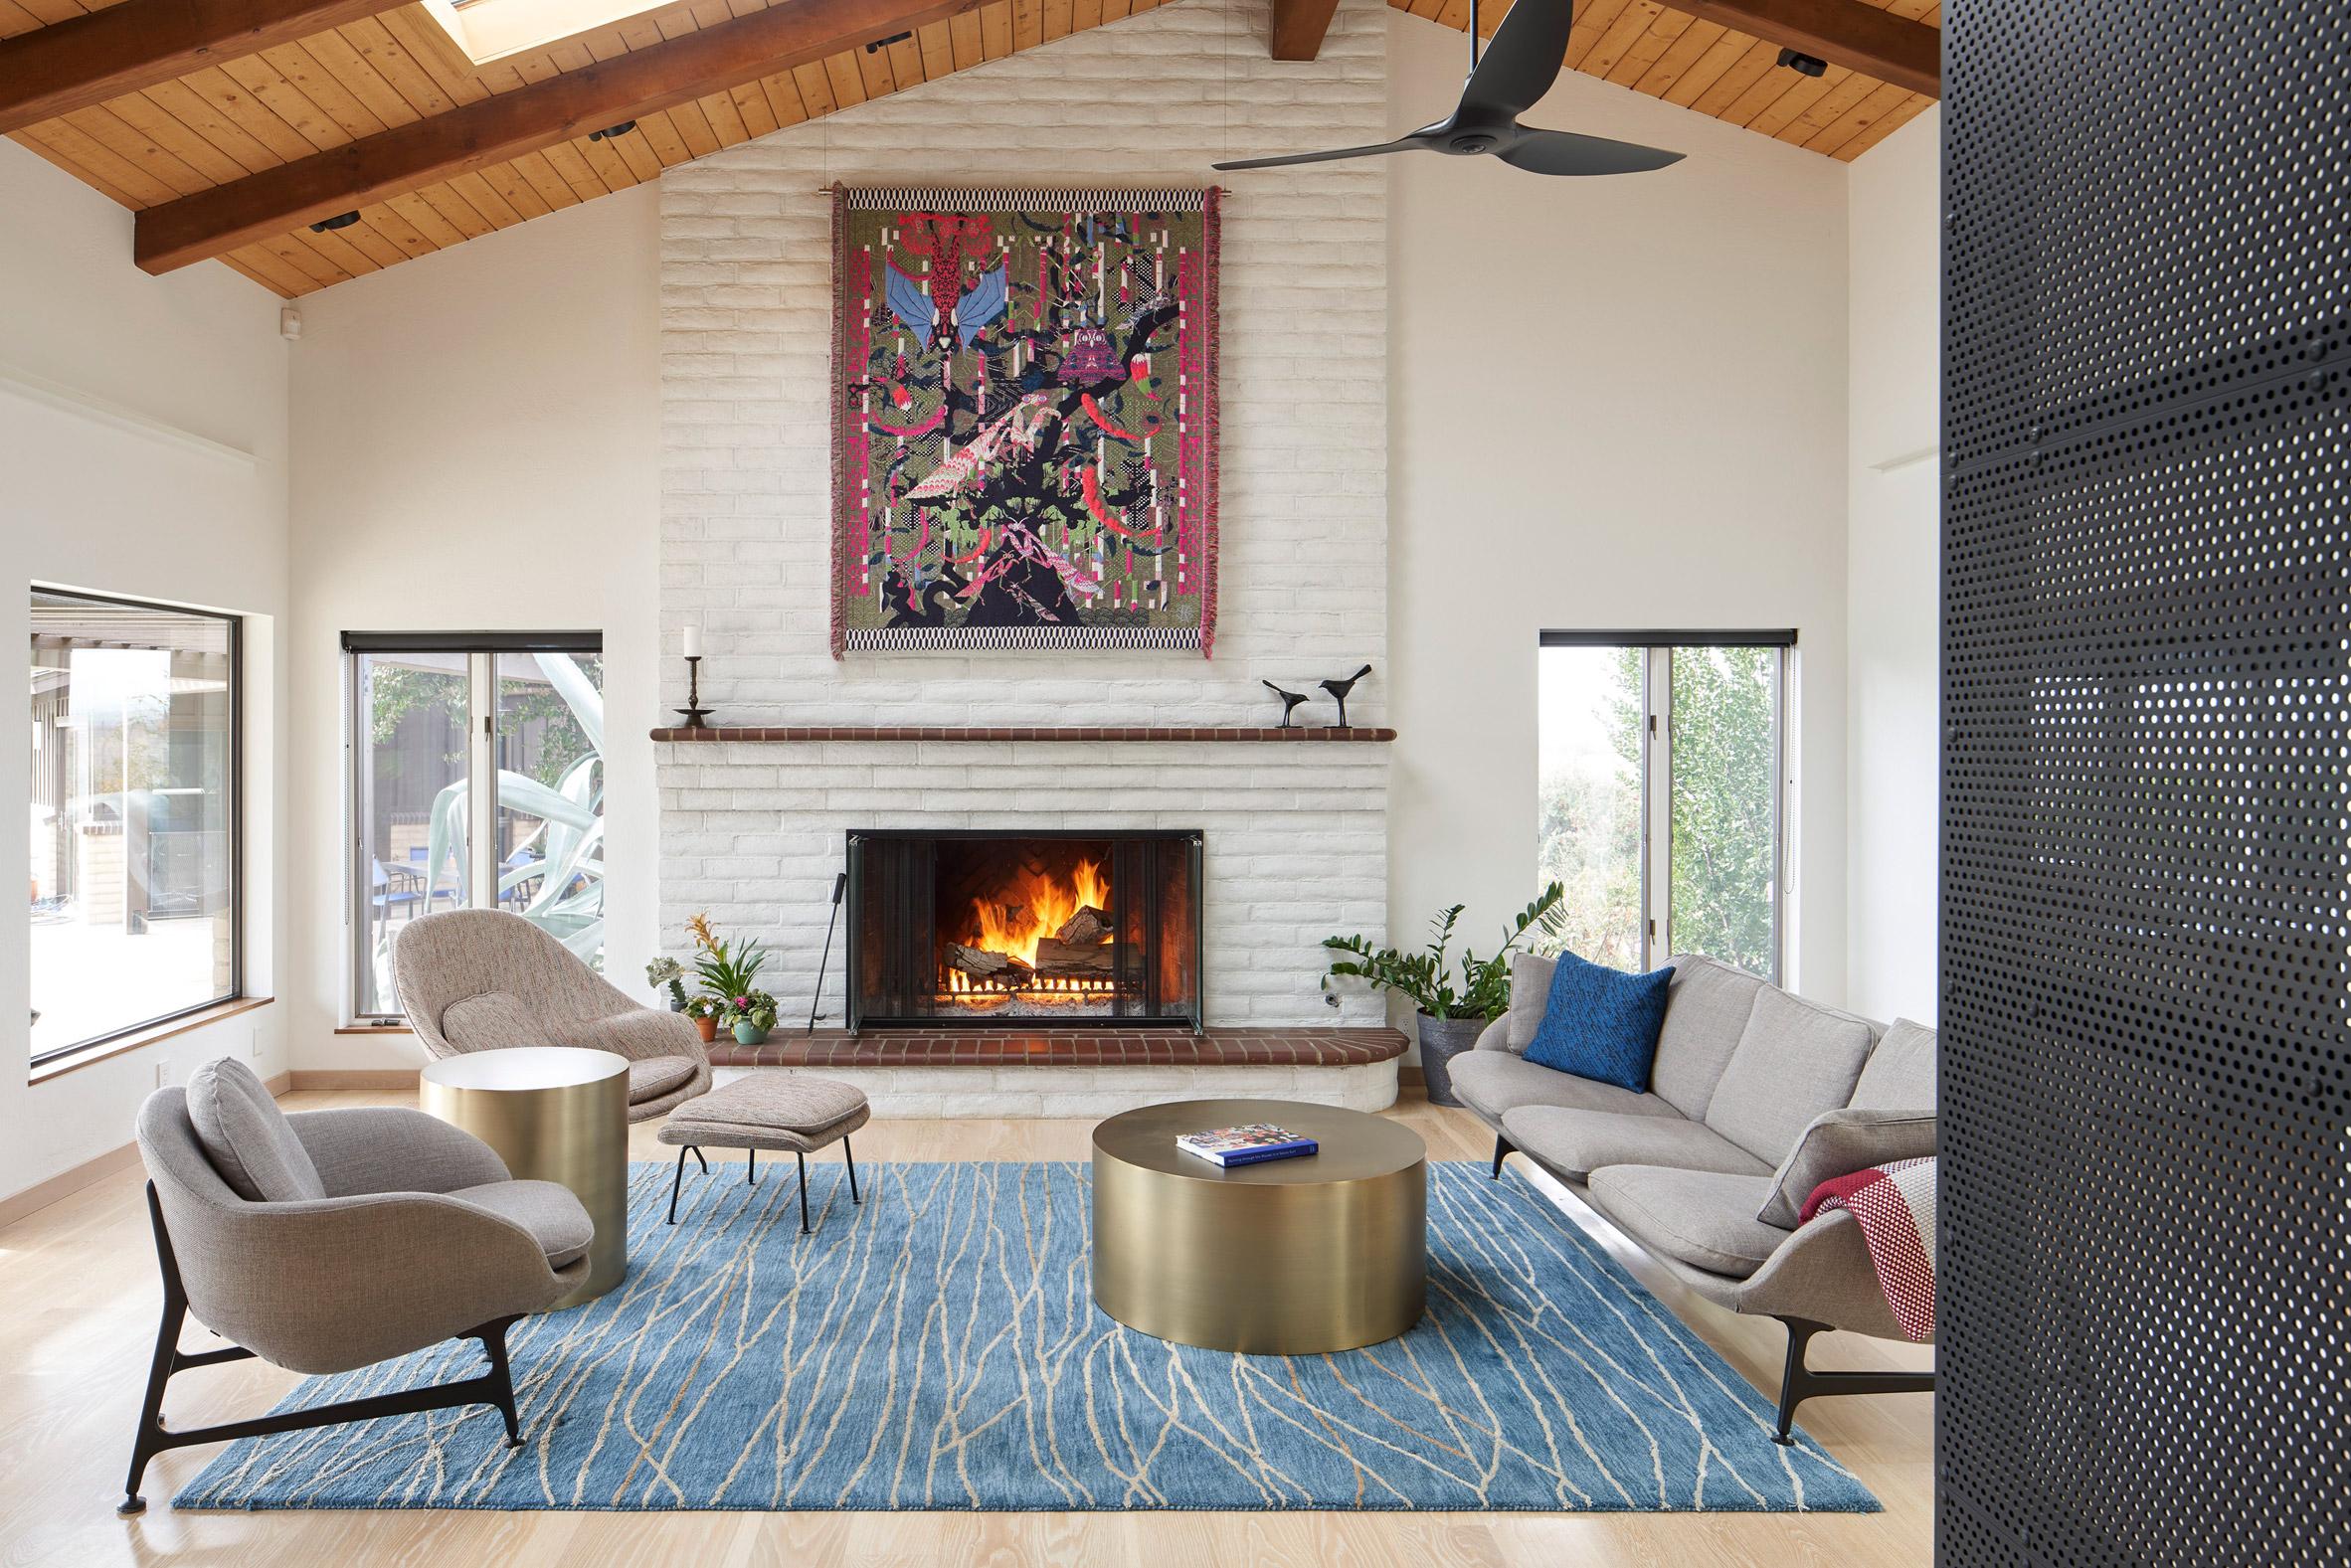 California farmhouse with white brick fireplace